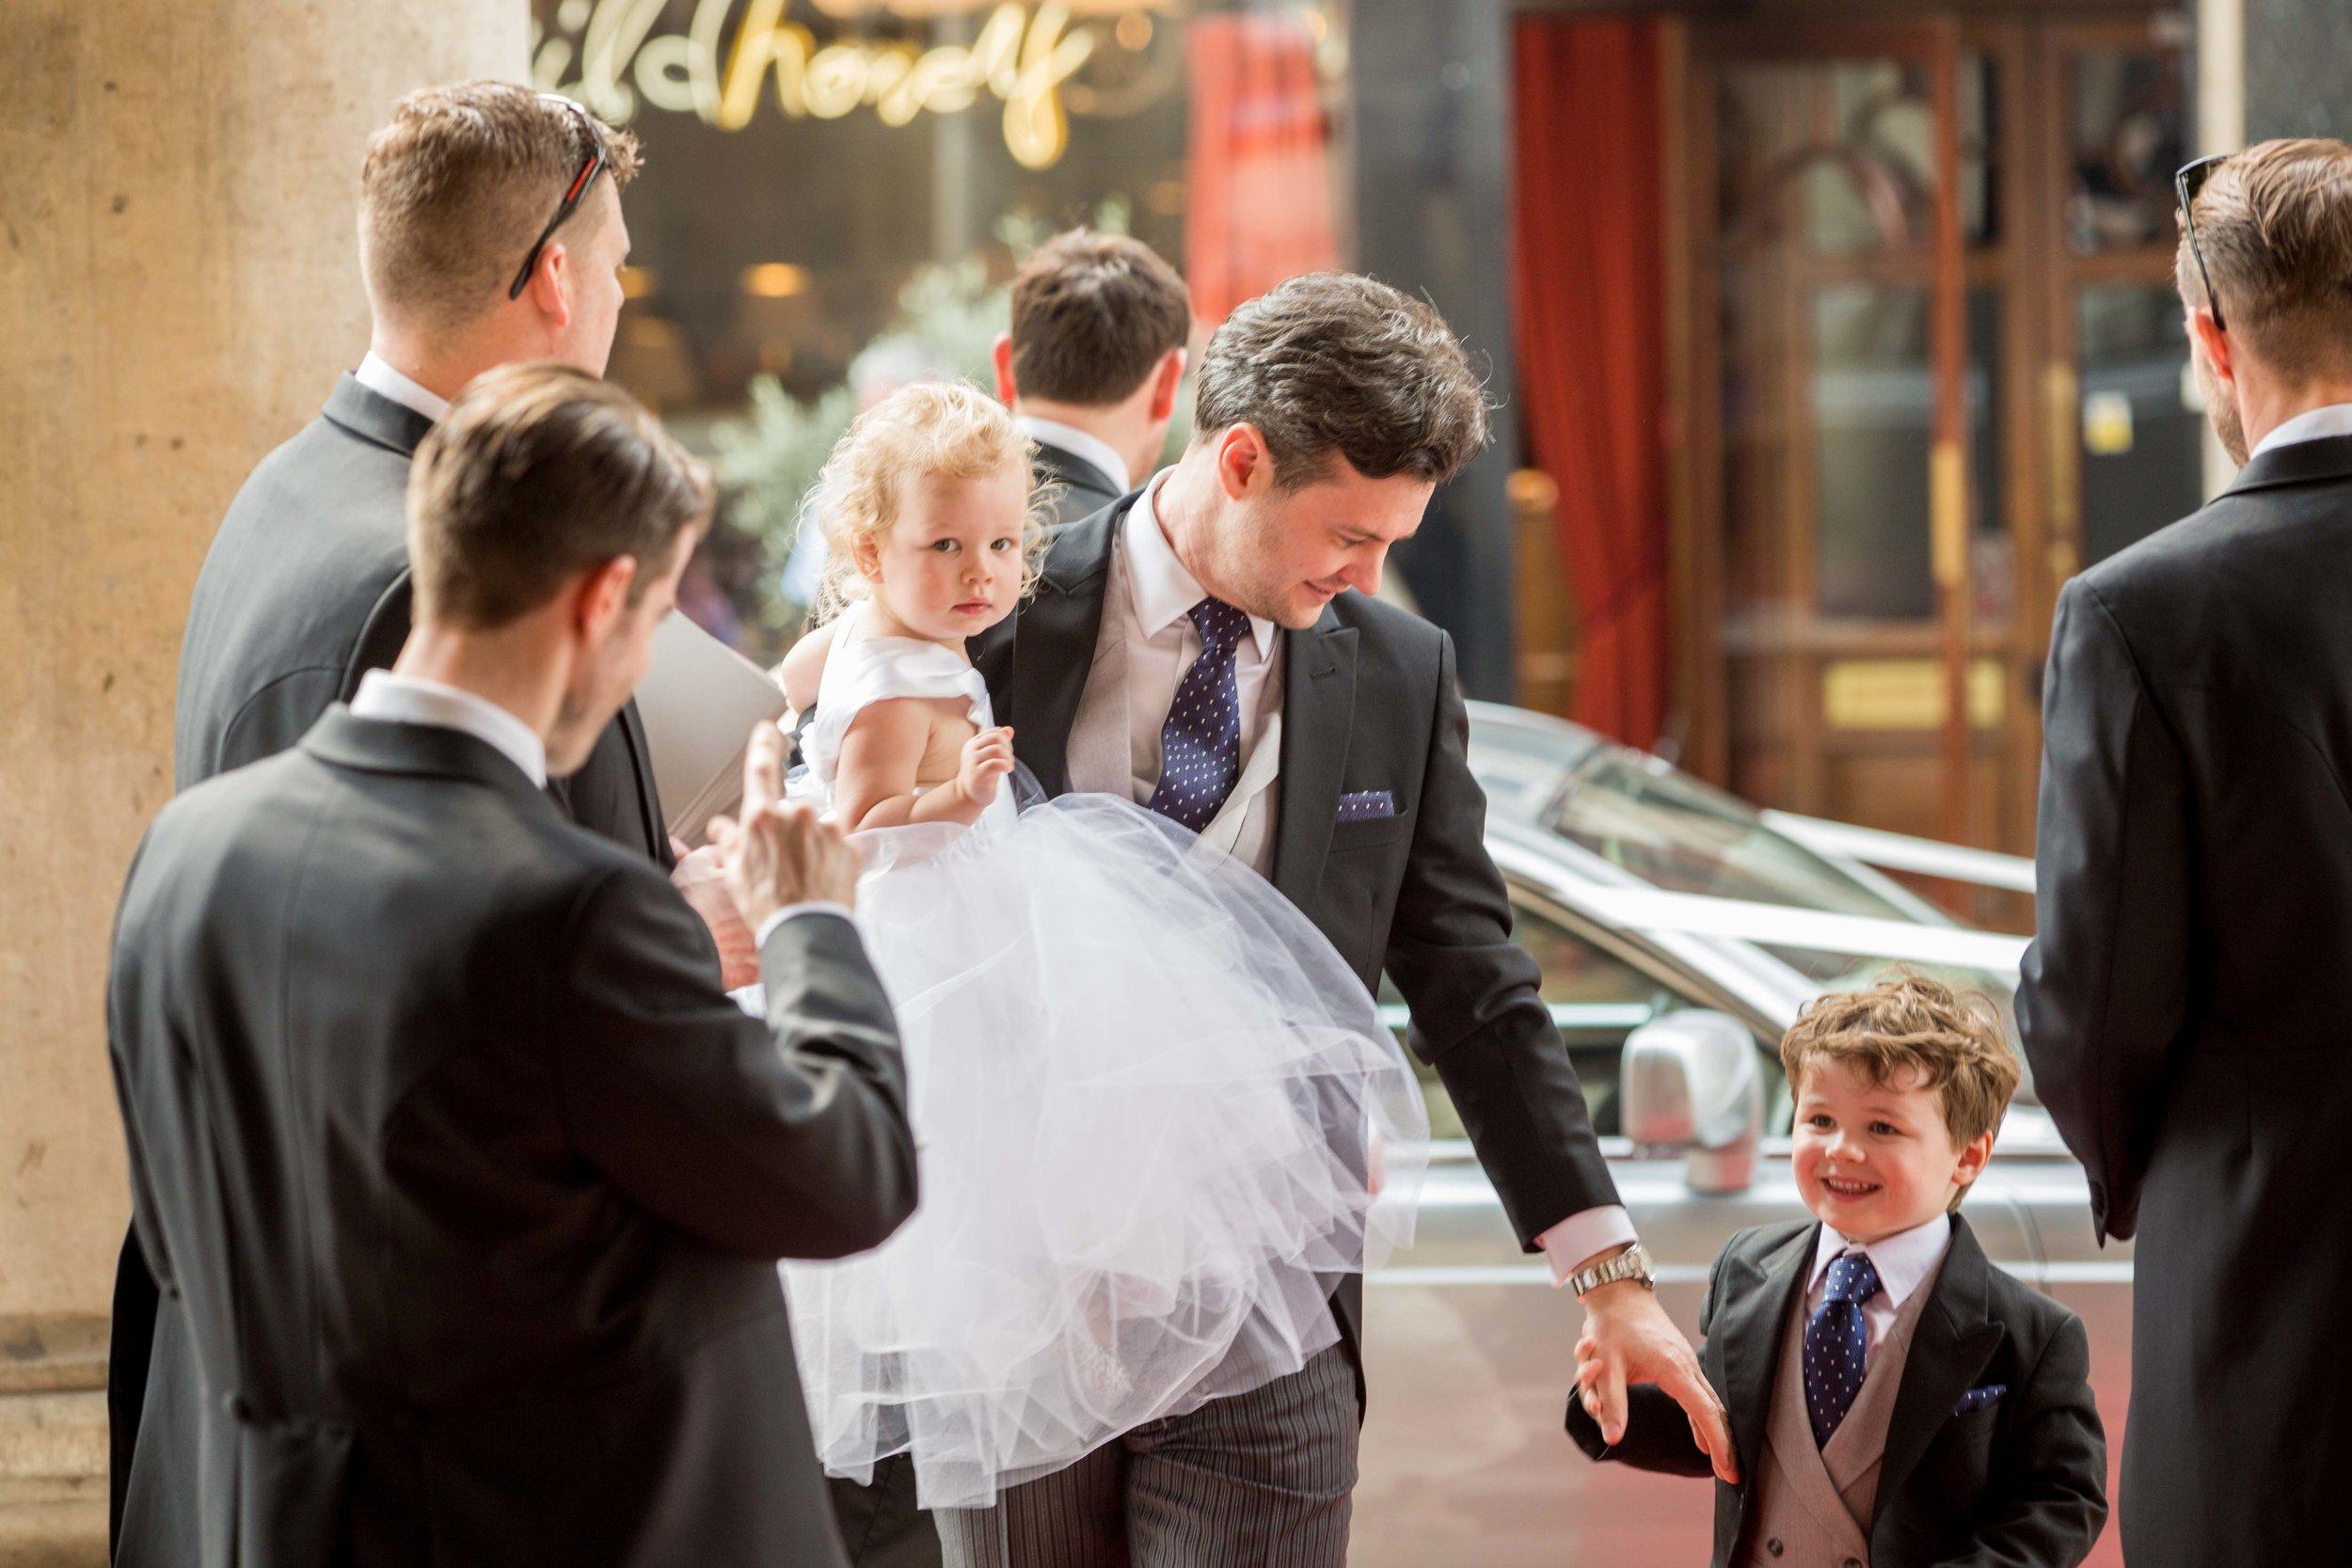 claridges-hotel-wedding-photographer-london-mayfair-natalia-smith-photography-43.jpg